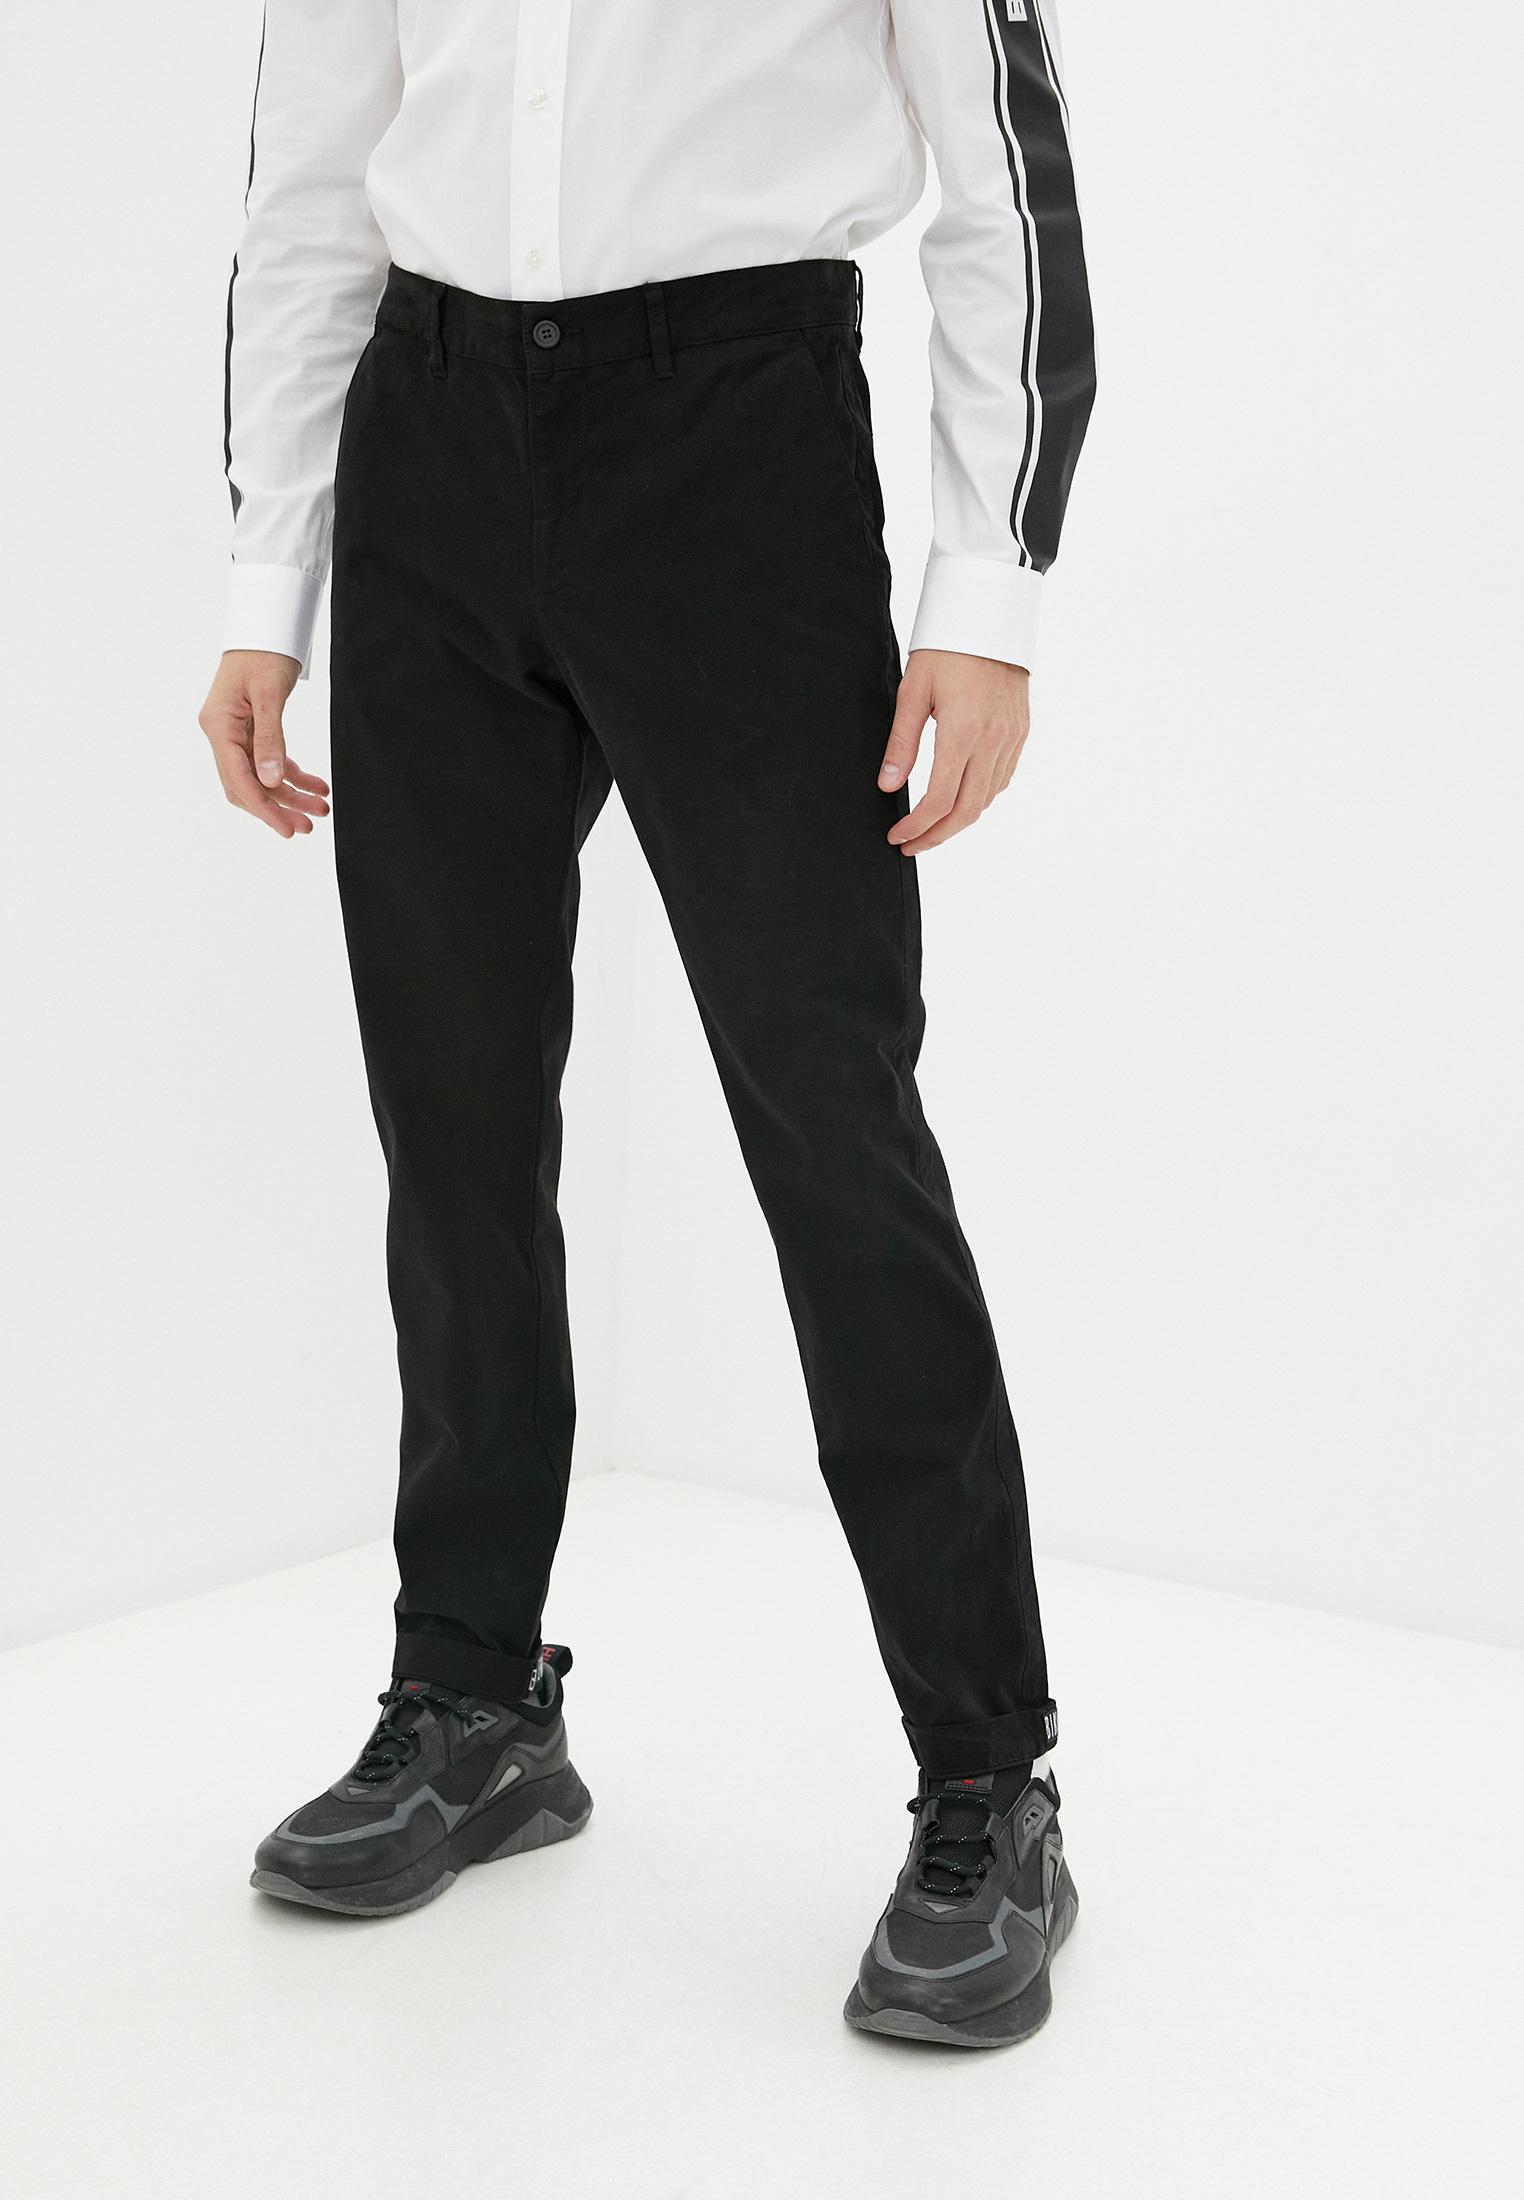 Рубашка с длинным рукавом Bikkembergs (Биккембергс) C C 052 5D S 2931